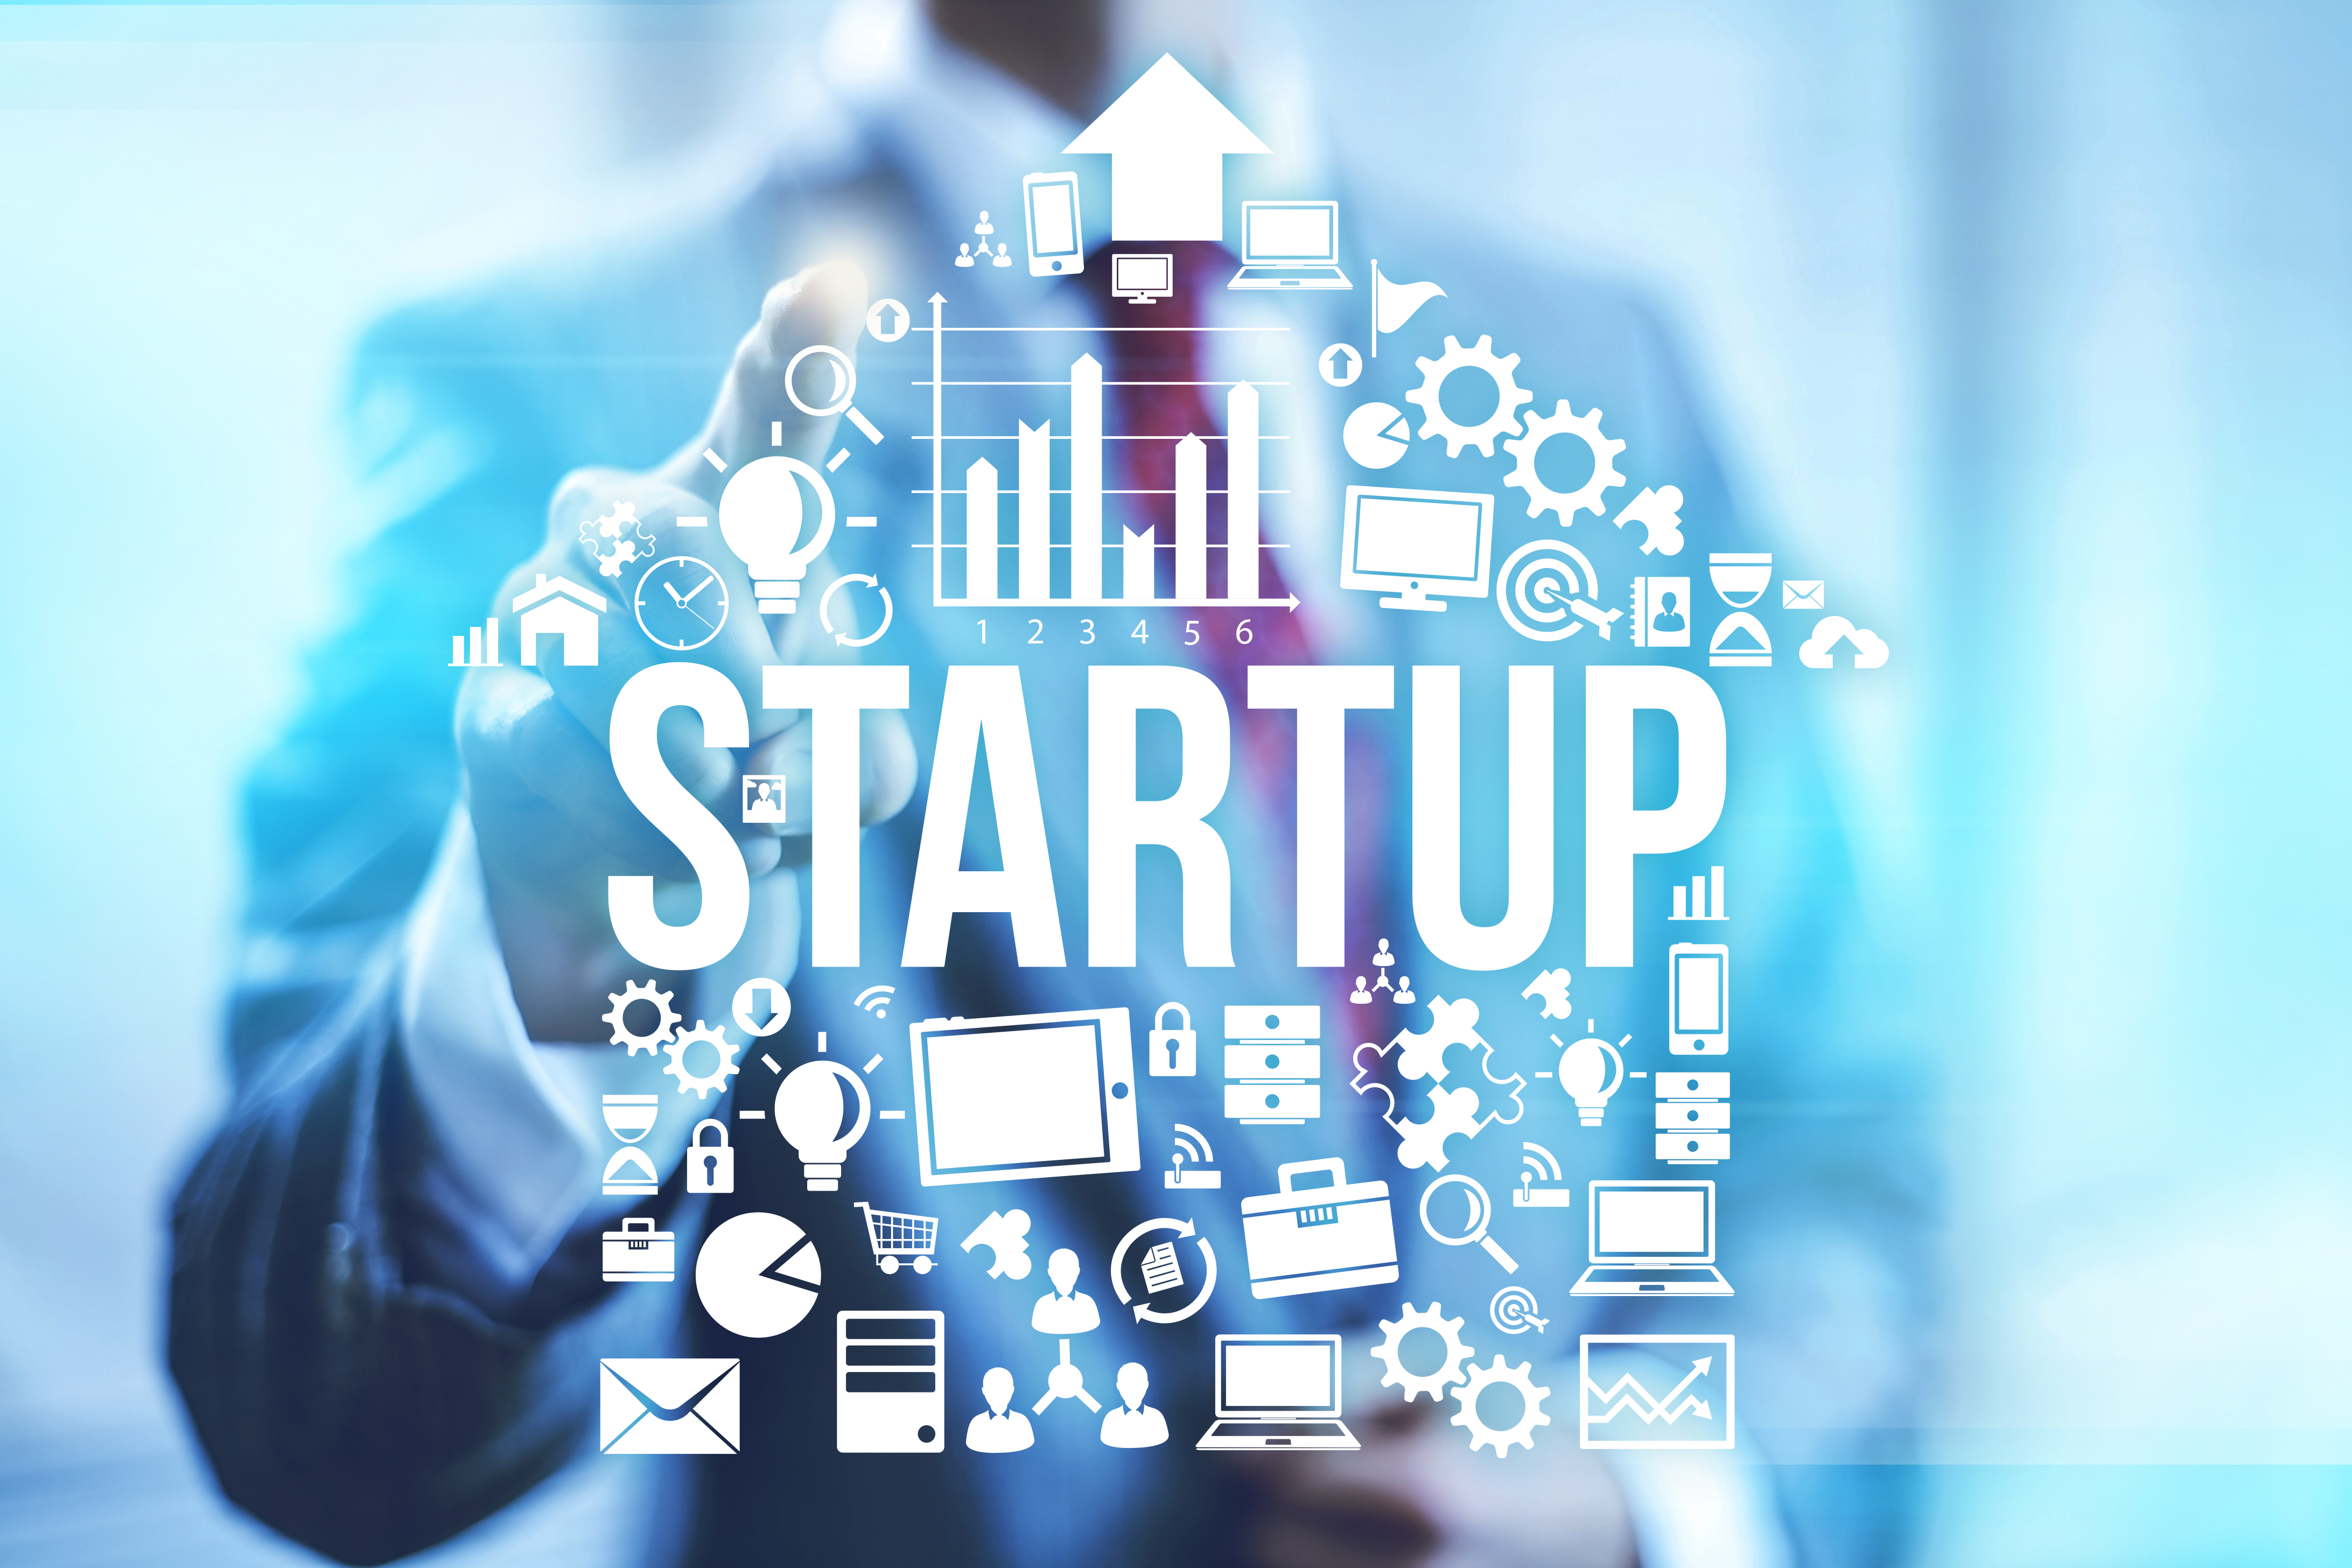 startup-business-concept.jpg